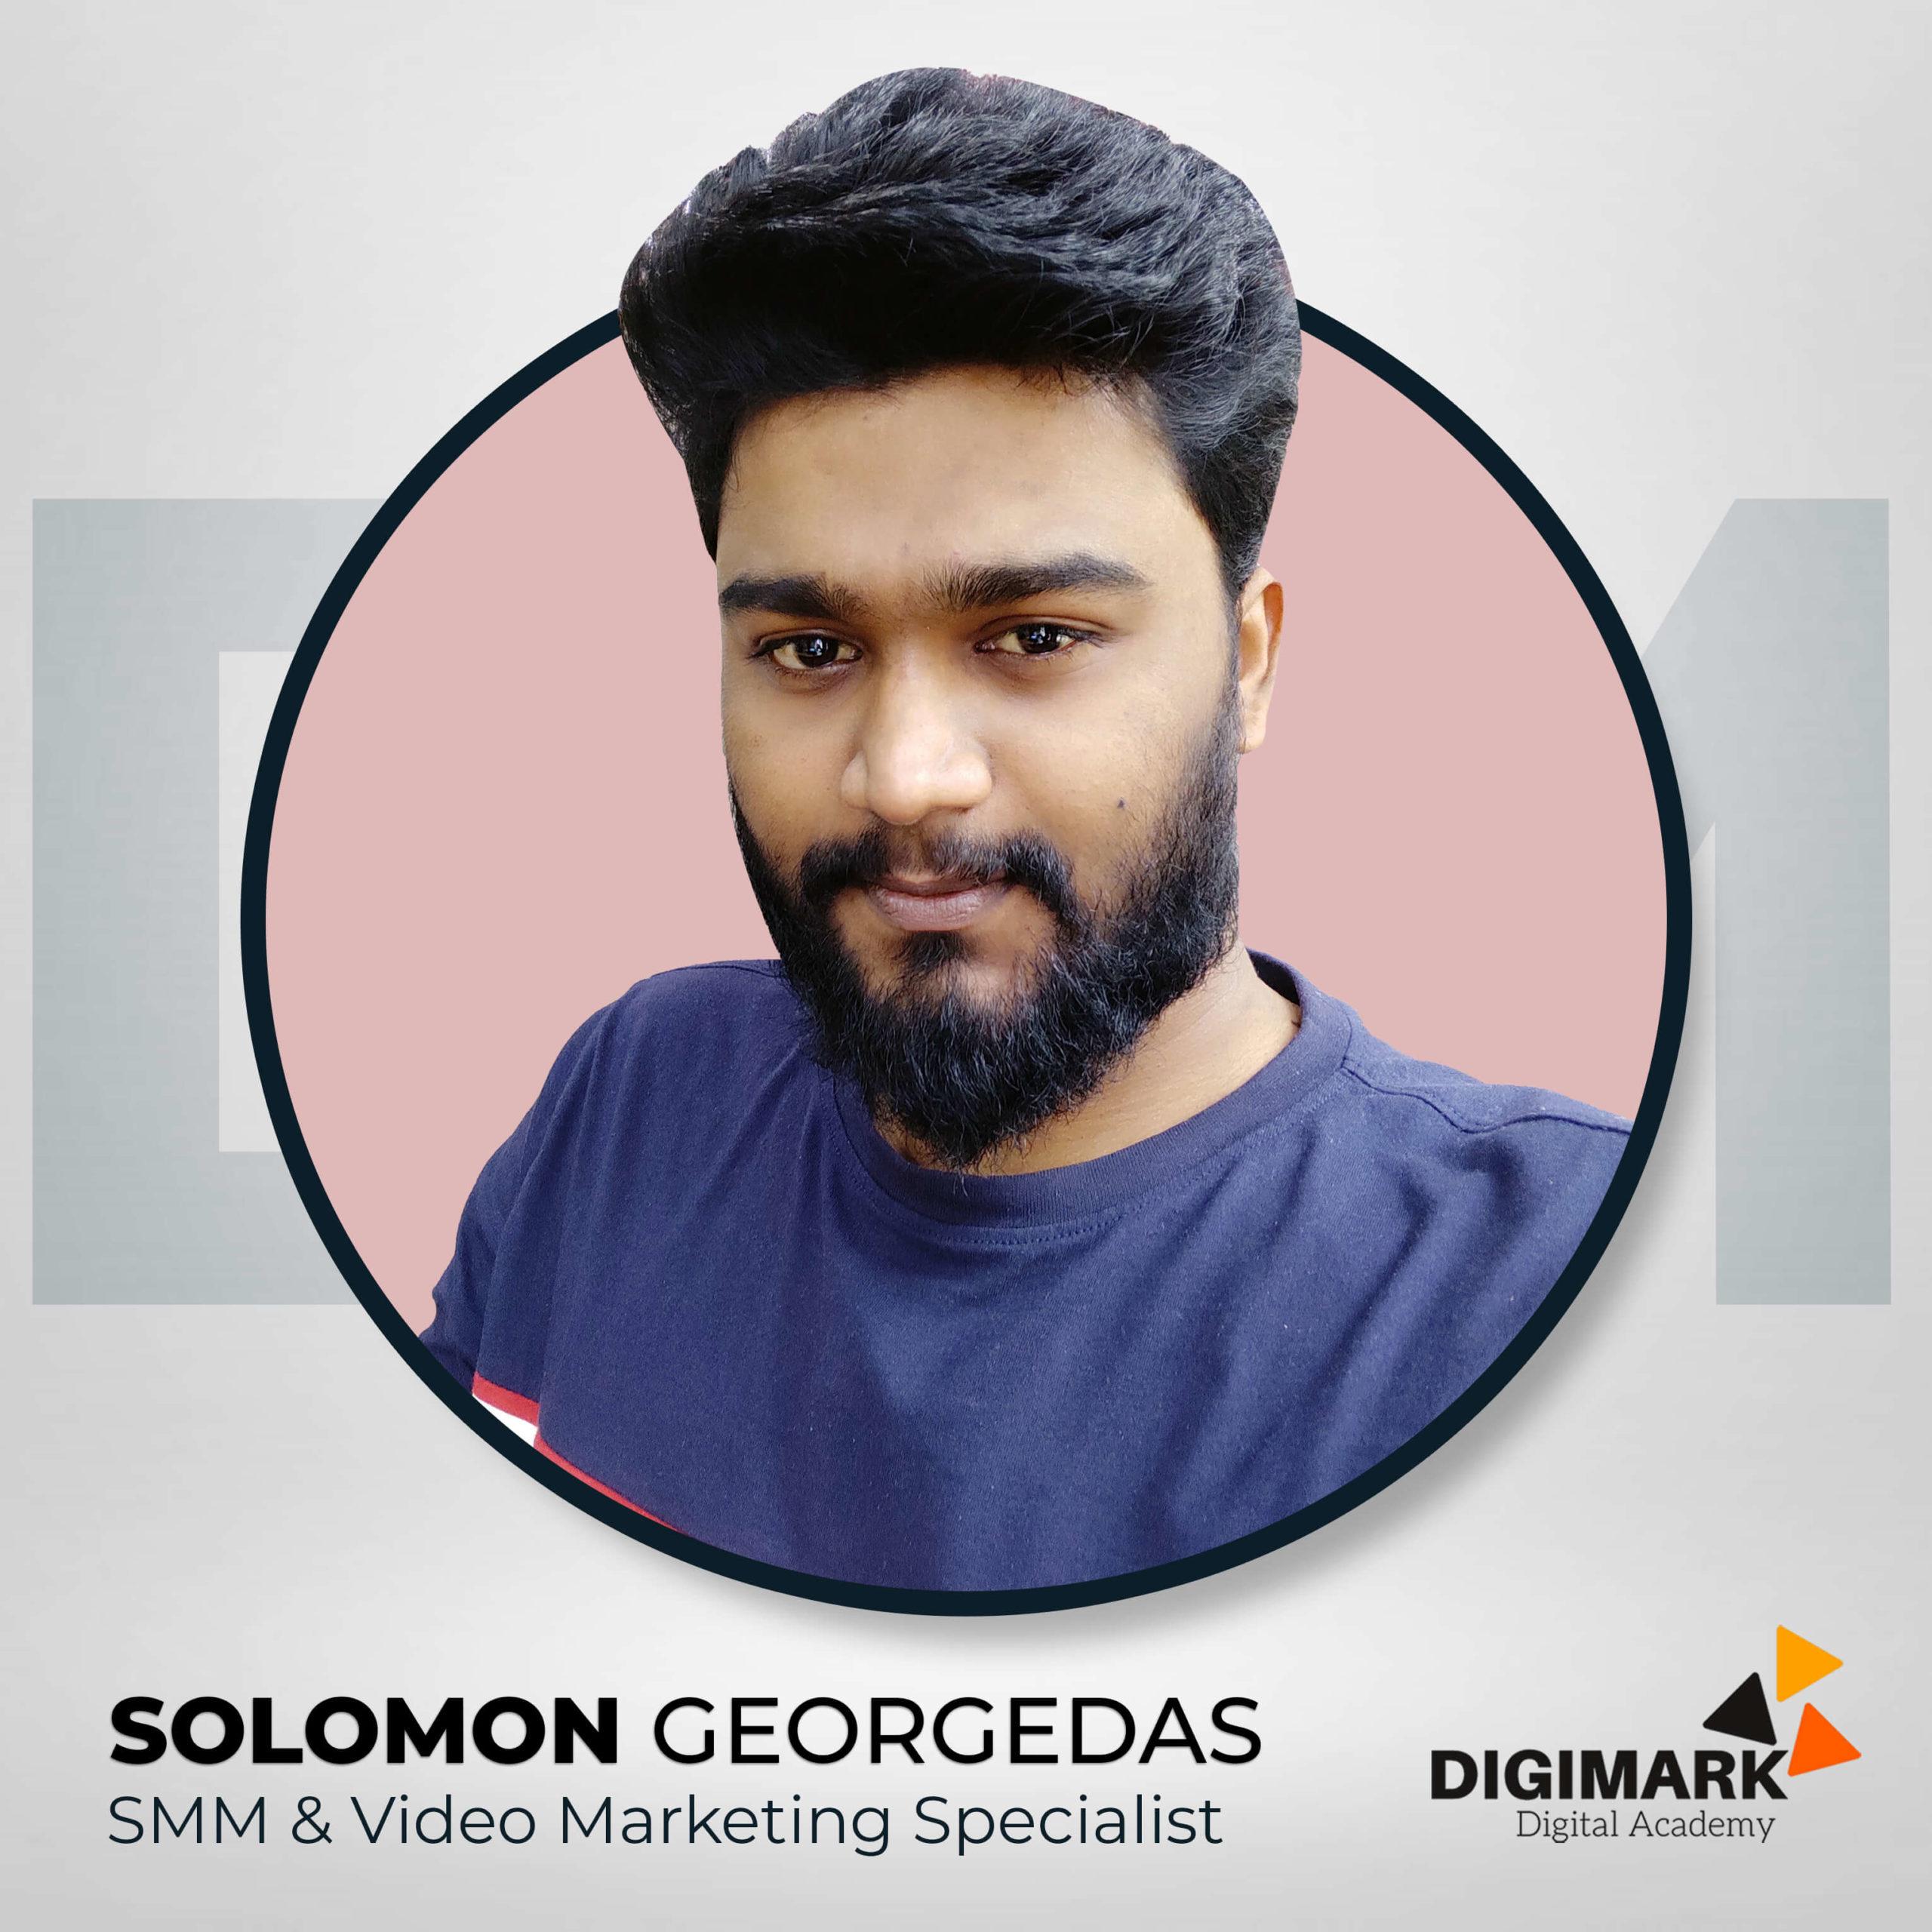 Solomon-georgedas-digimark-academy